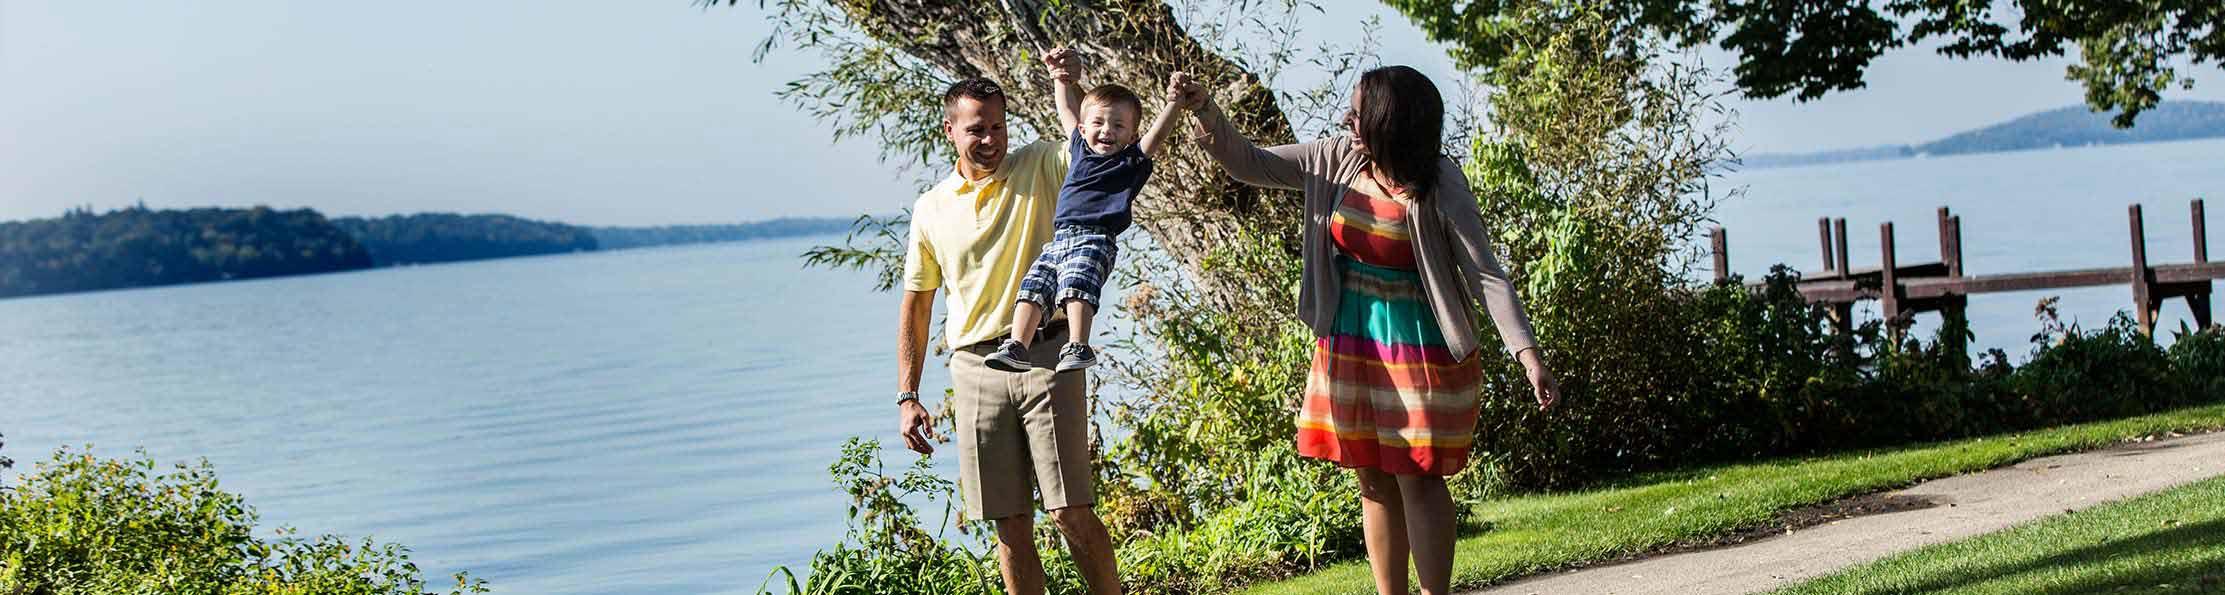 Family Fun on Green Lake, green lake wi, heidel house resort & spa